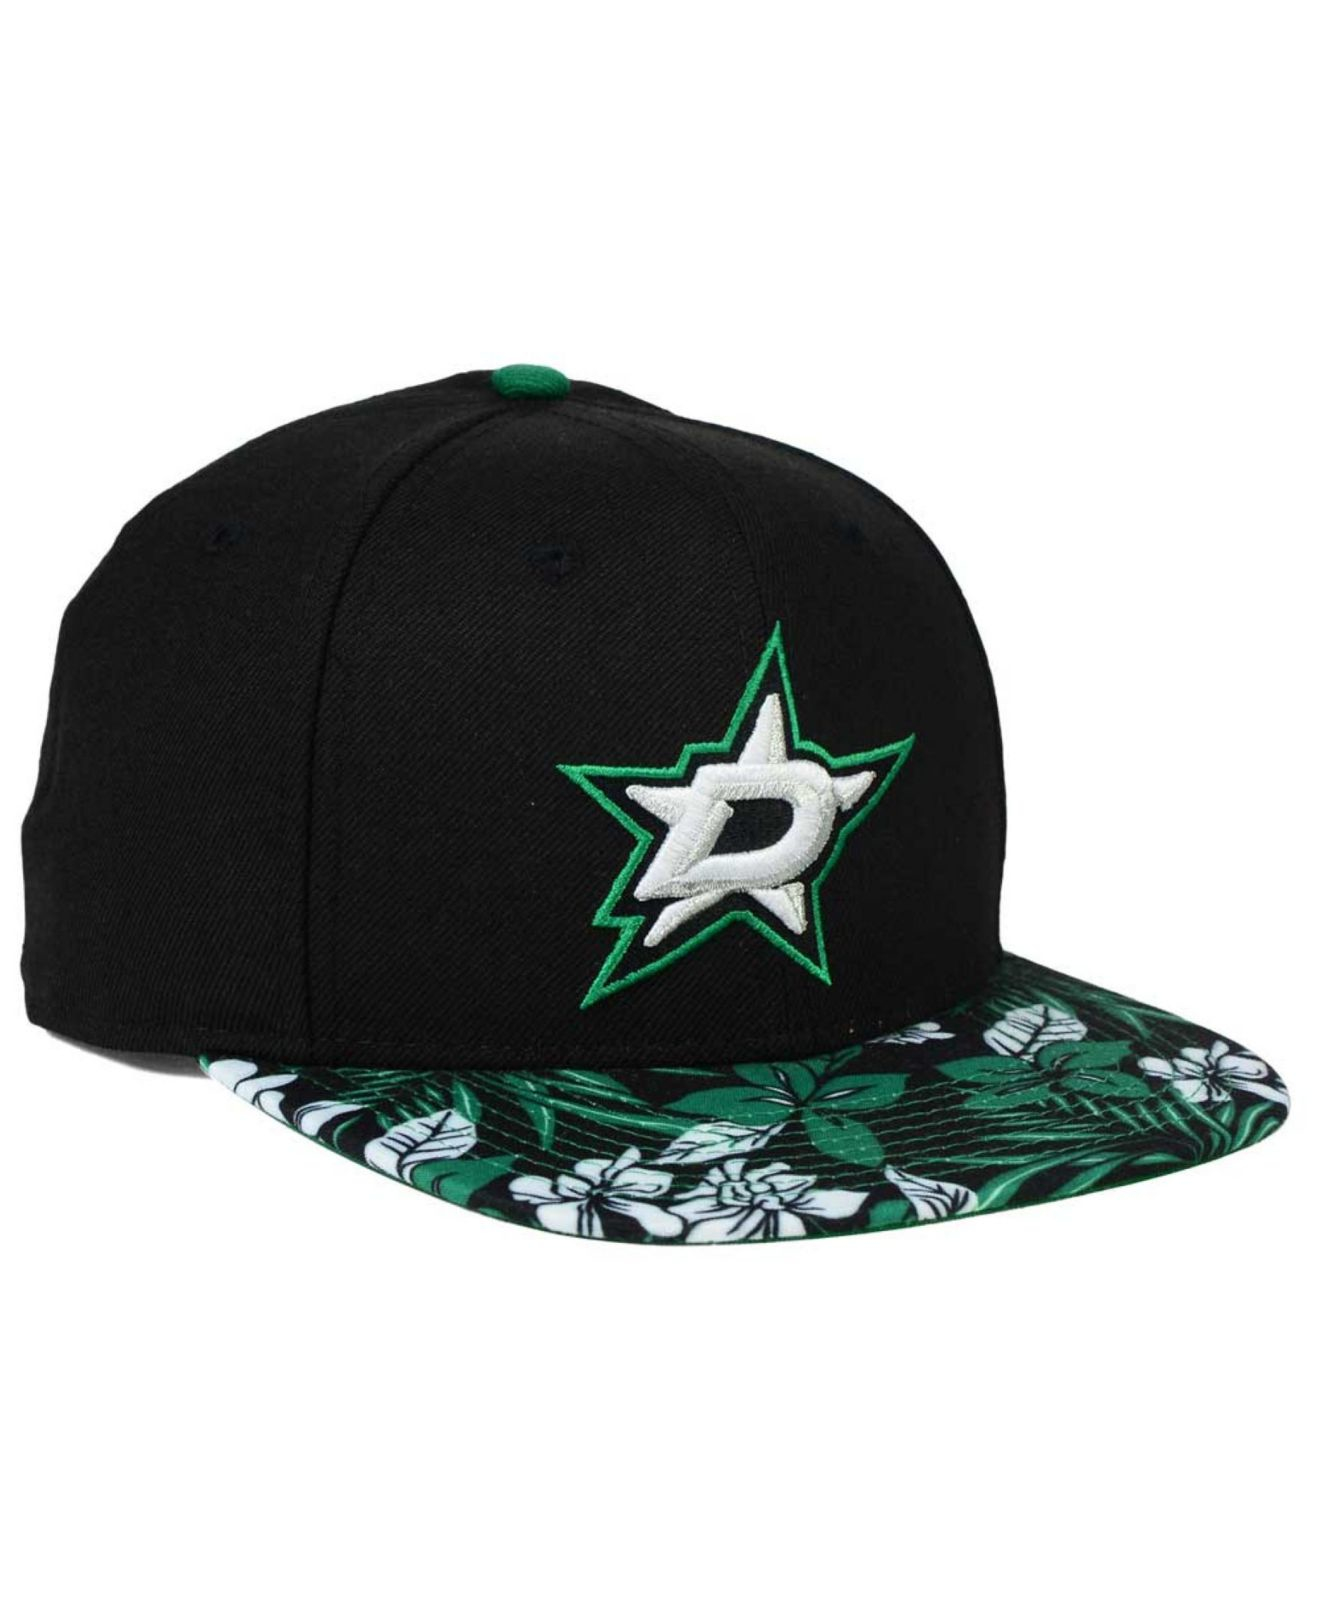 b0a400f8a KTZ Dallas Stars Wowie 9fifty Snapback Cap in Black for Men - Lyst